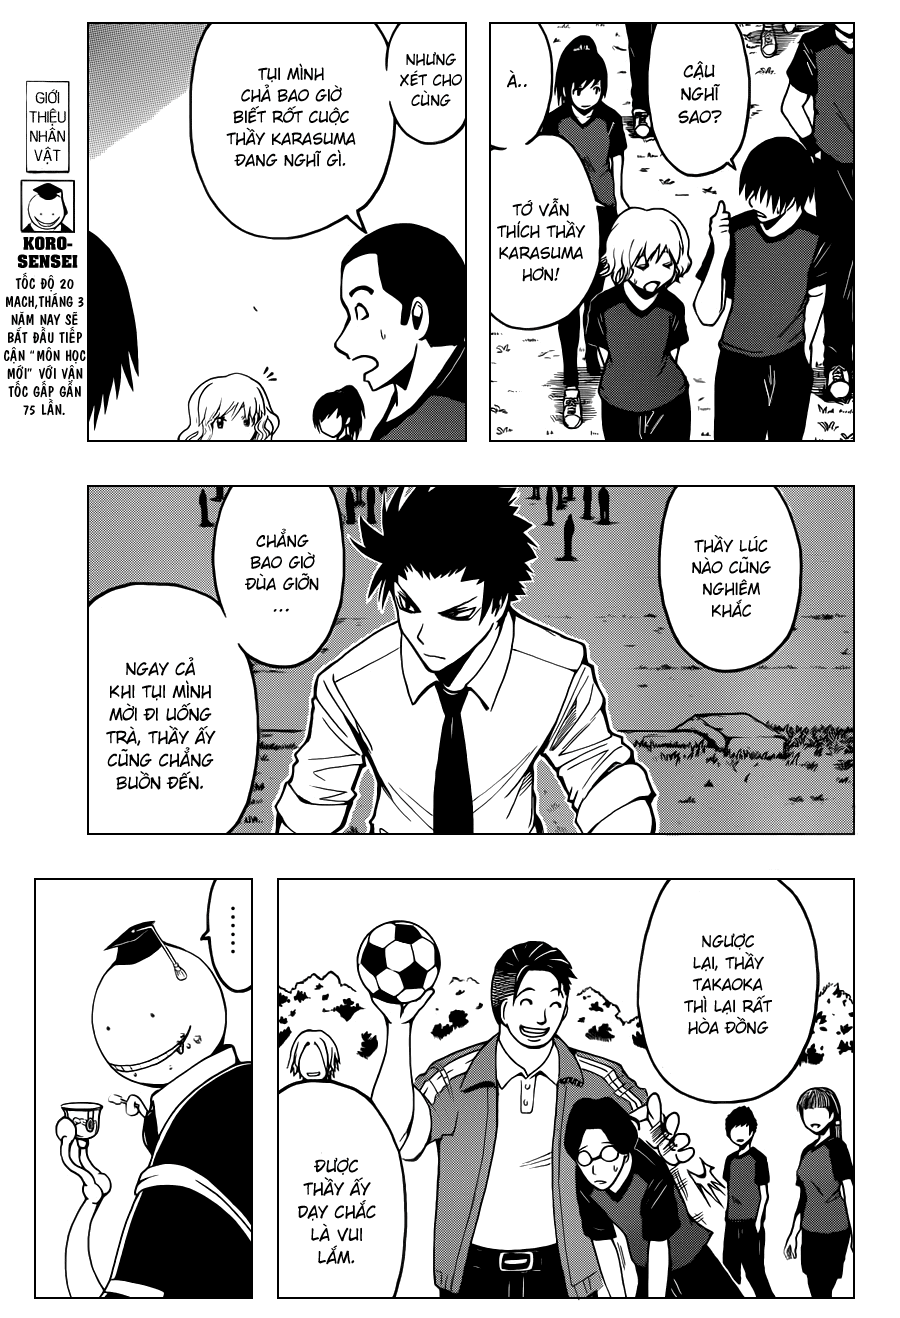 Ansatsu Kyoushitsu chap 39 trang 4